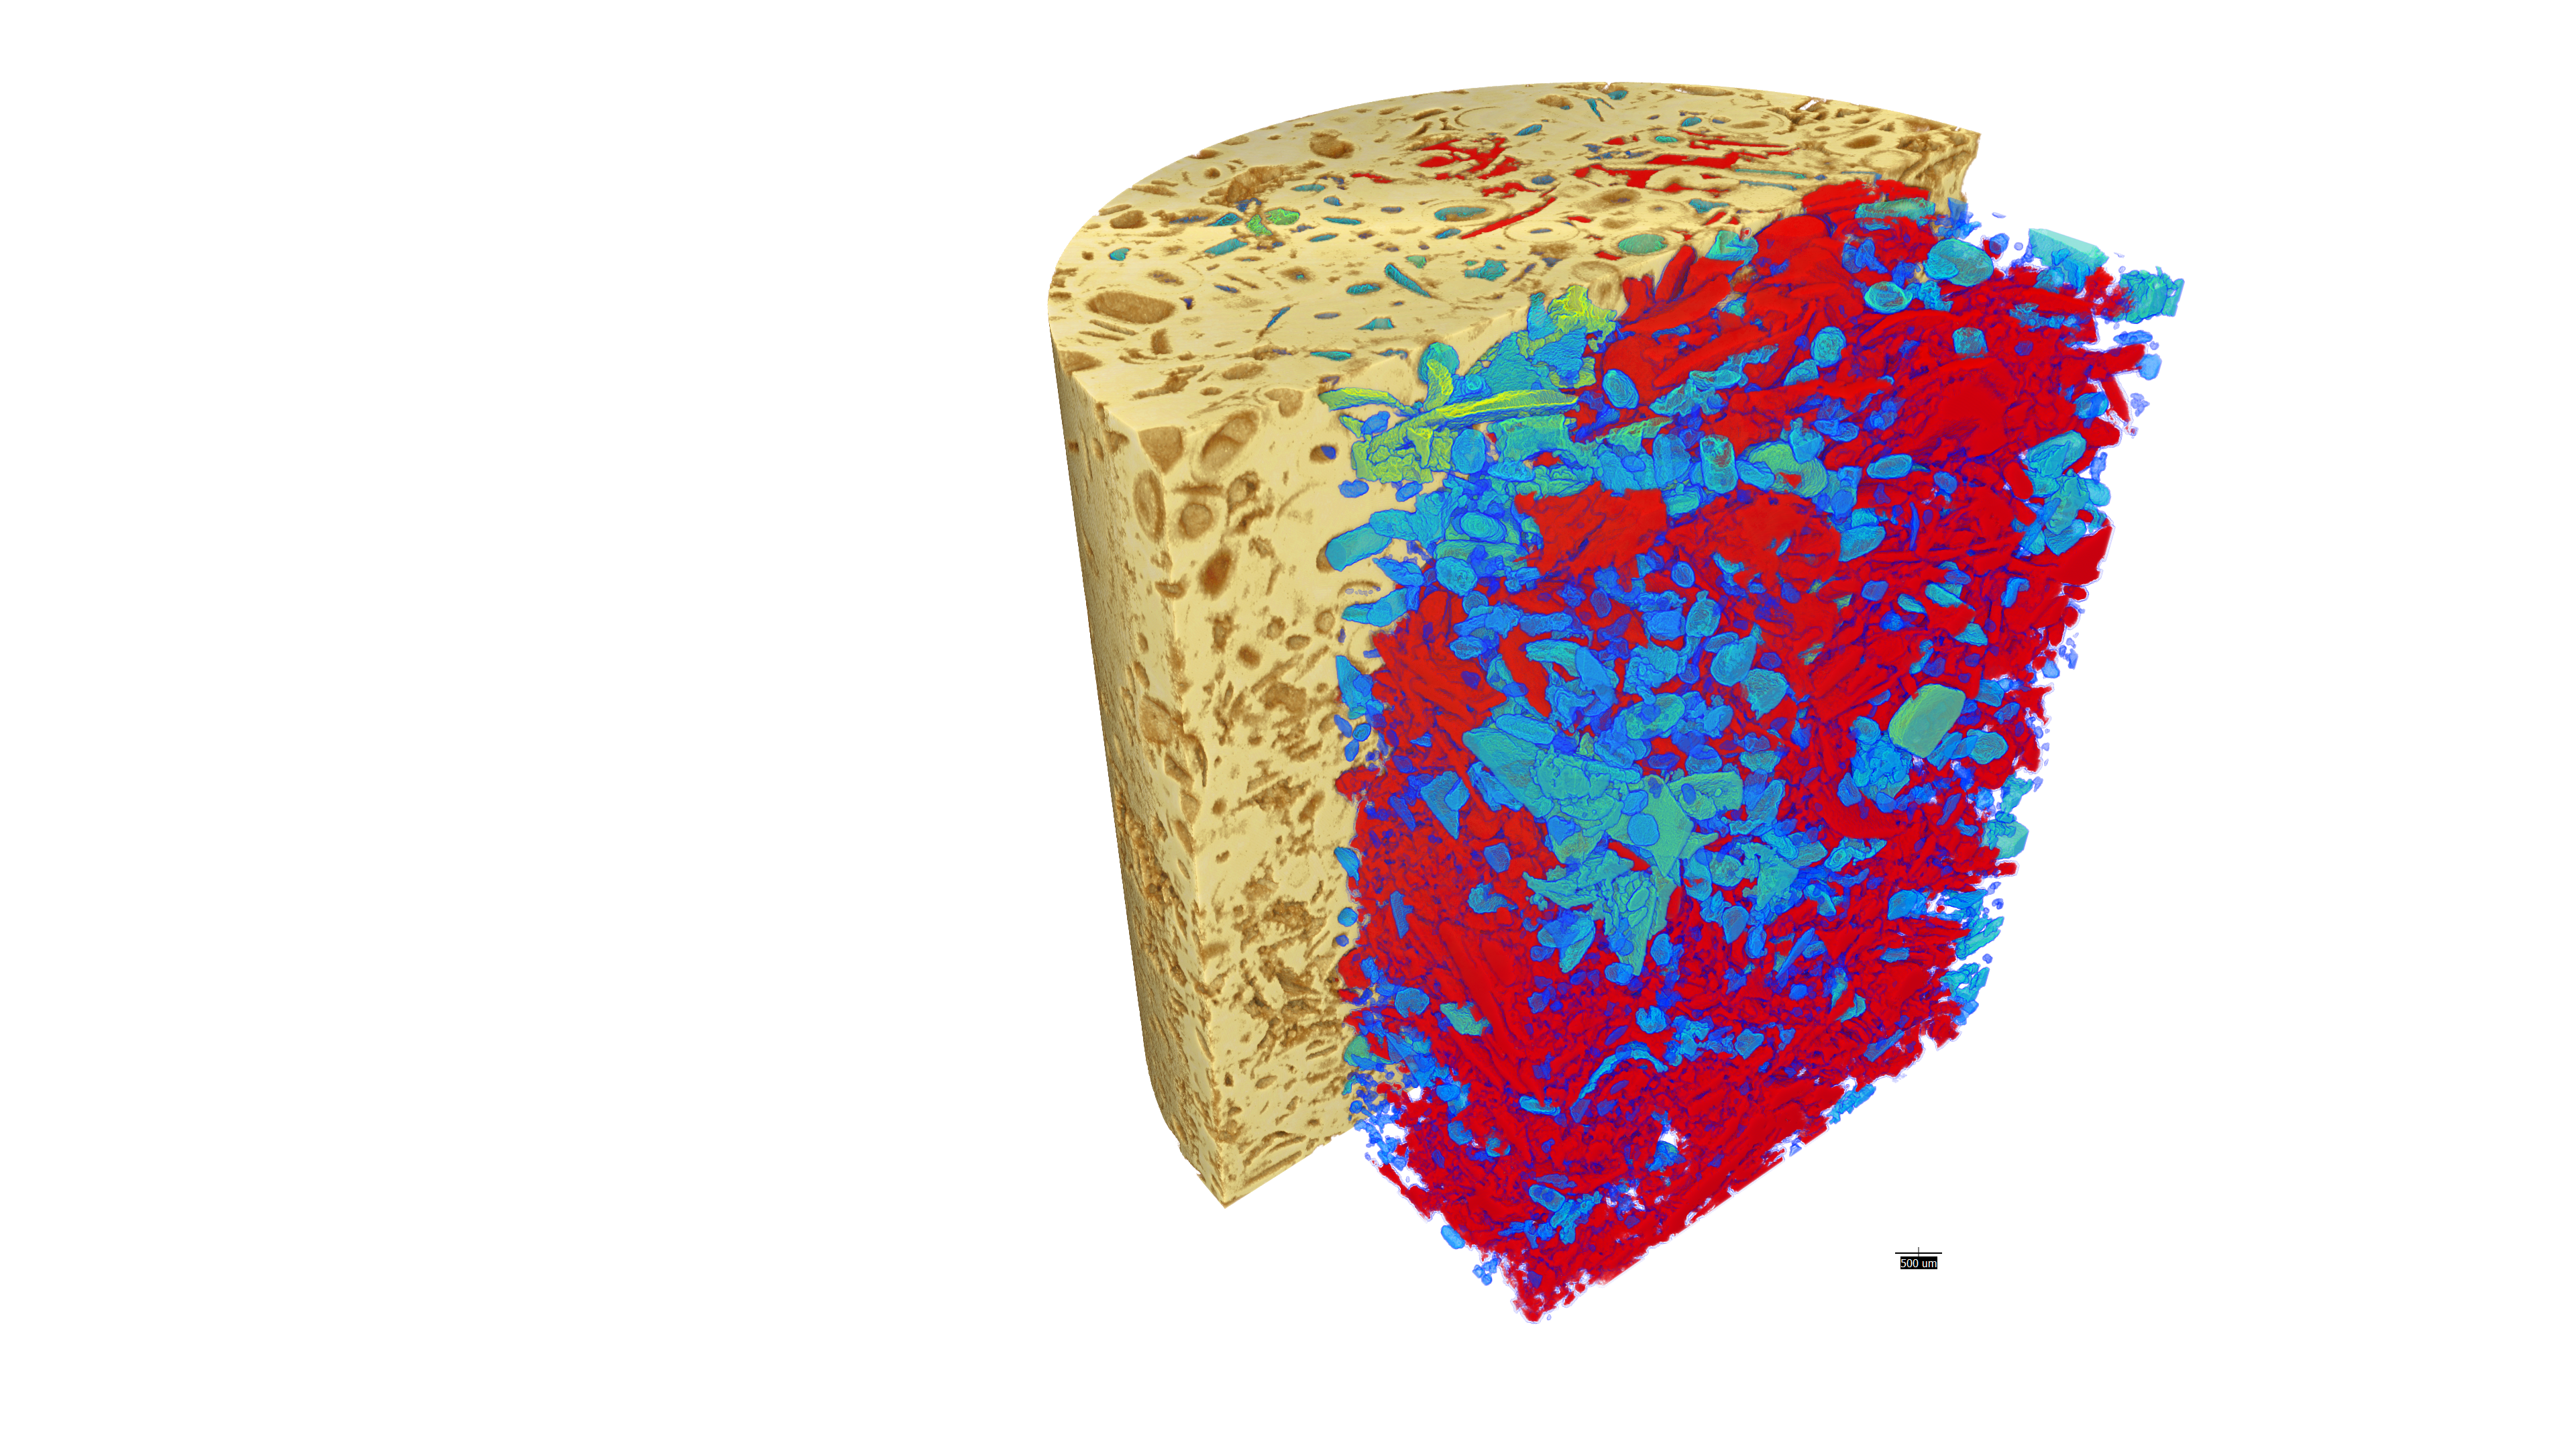 Carbonate – segmented volume of interest scan (VOIS) - Open porosity calculation